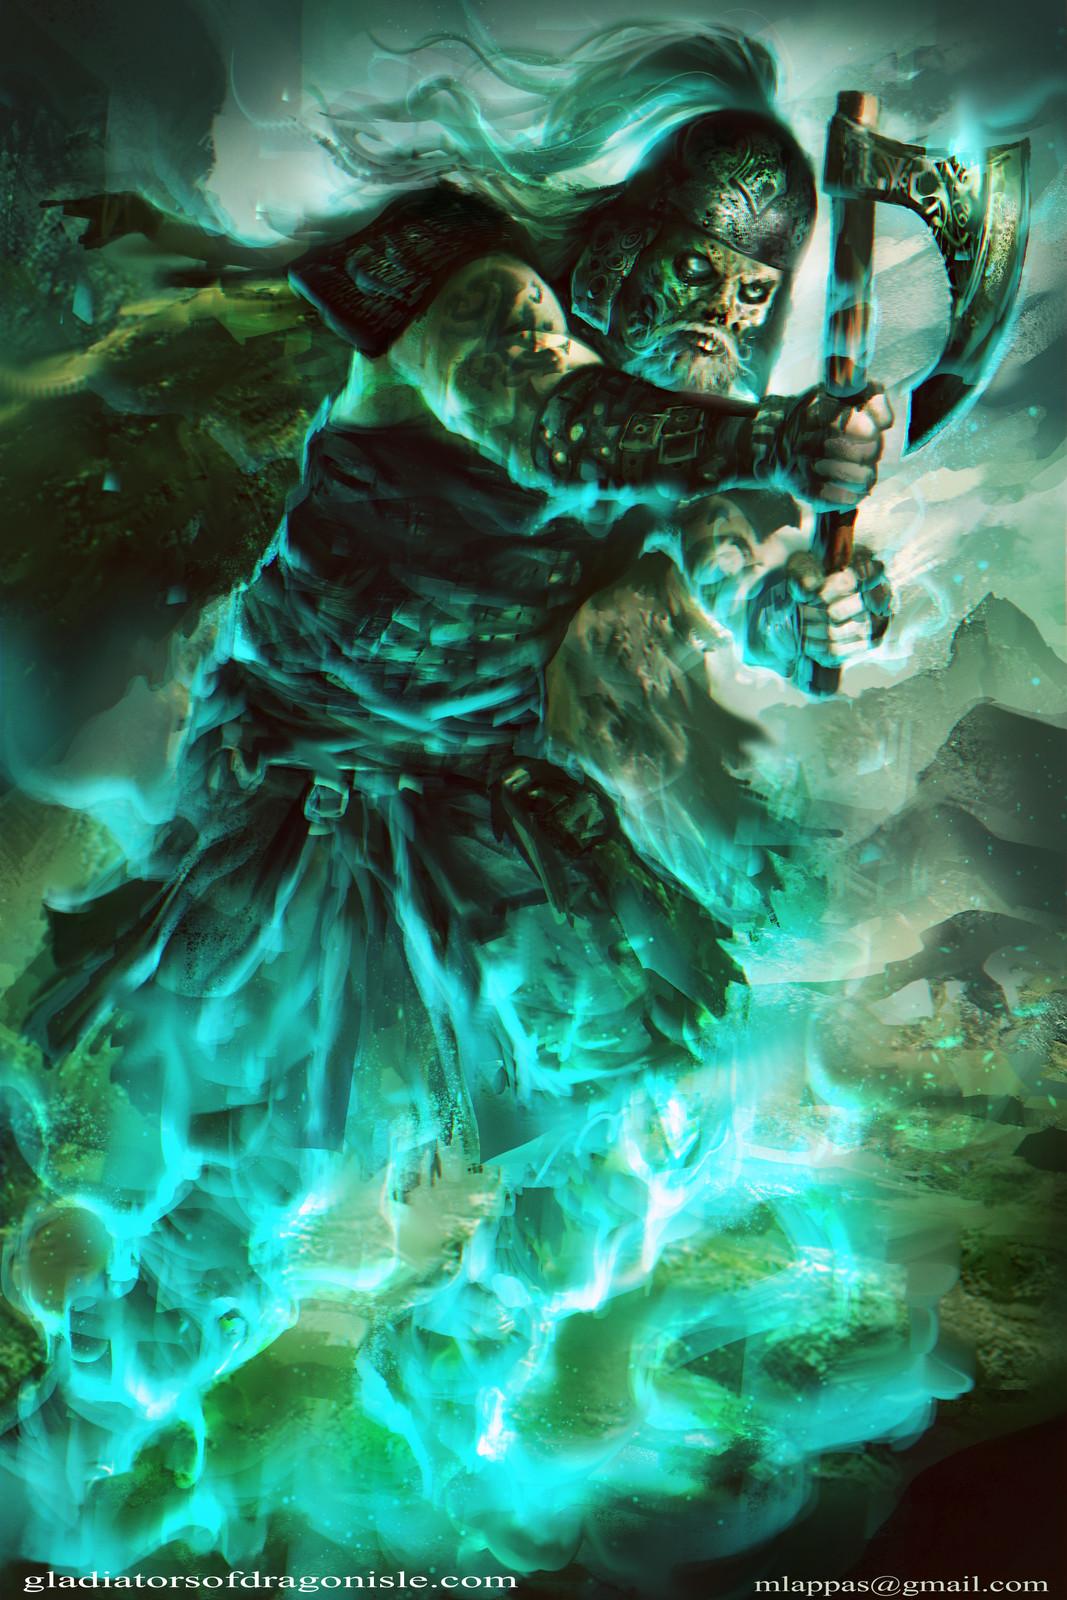 Death Wisp-Gladiators of Dragon Isle|board game